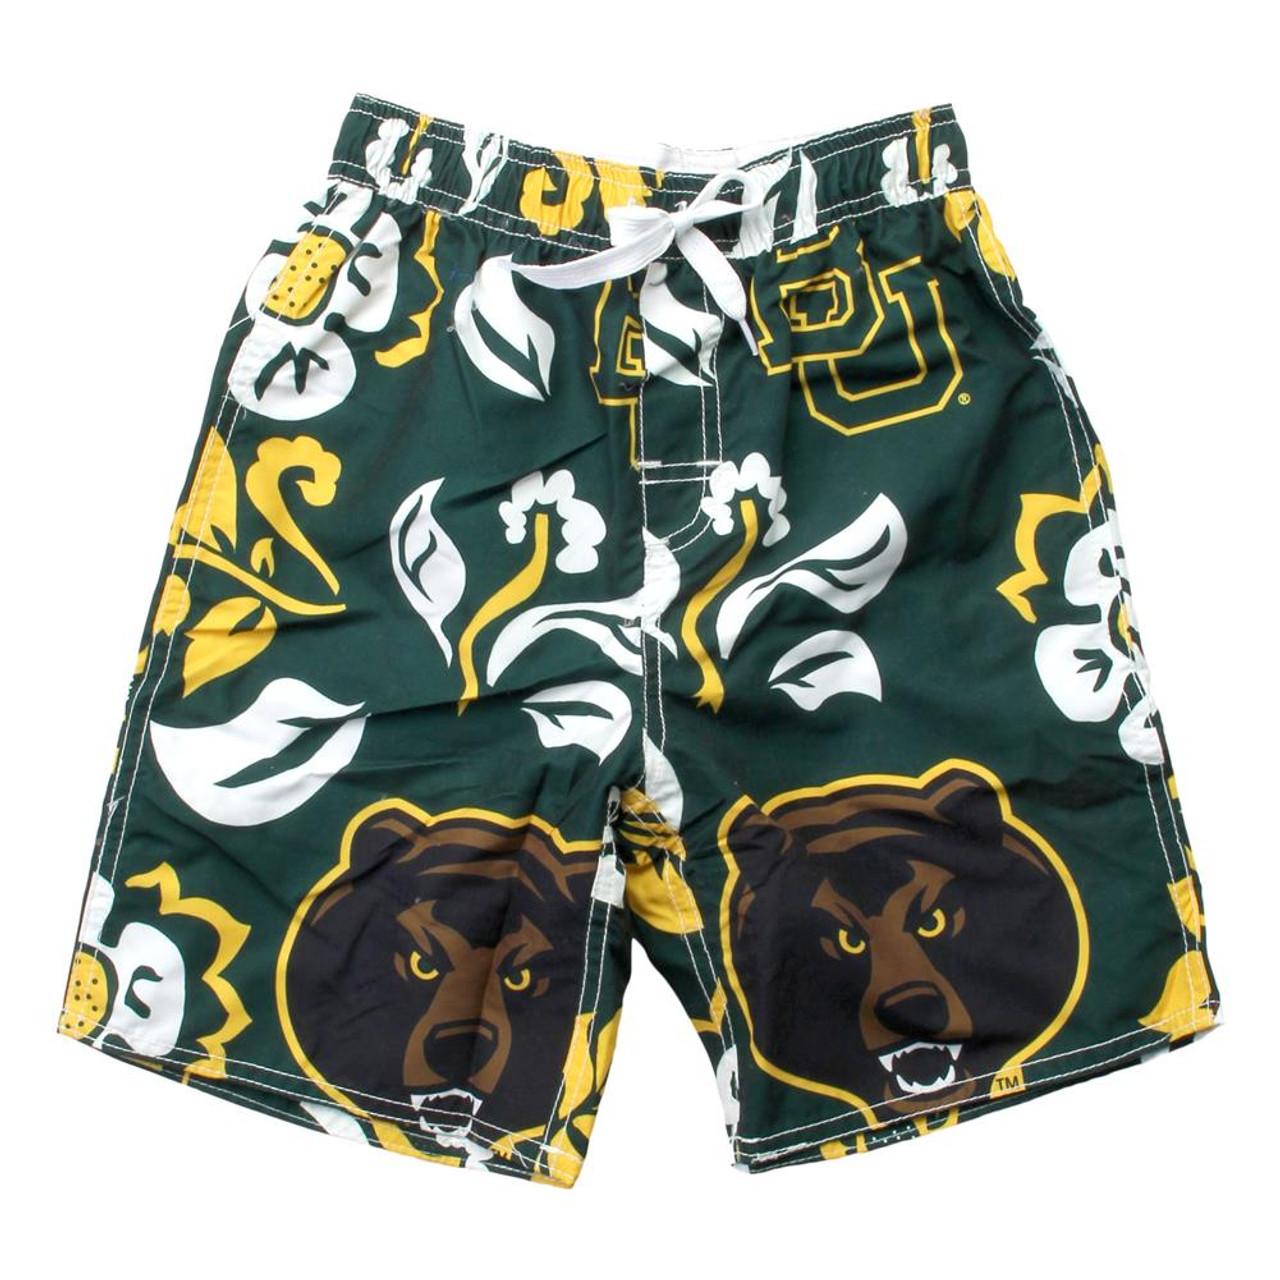 Youth Baylor University Bears Swim Trunks Boys Floral Swim Shorts